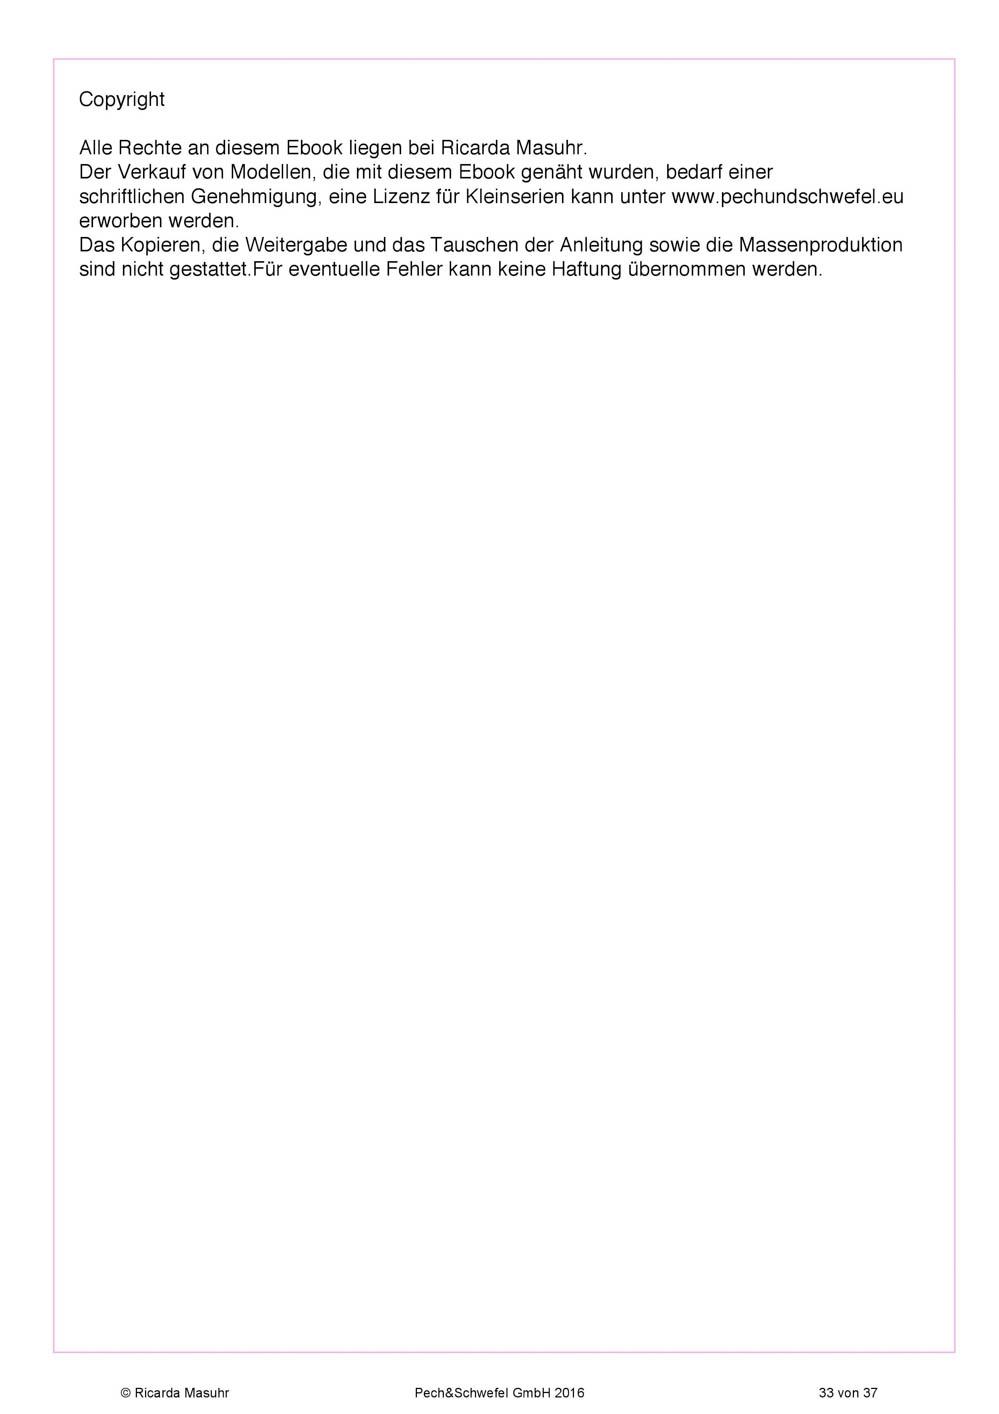 SchnittmusterWinterhudePechUndSchwefel-0033